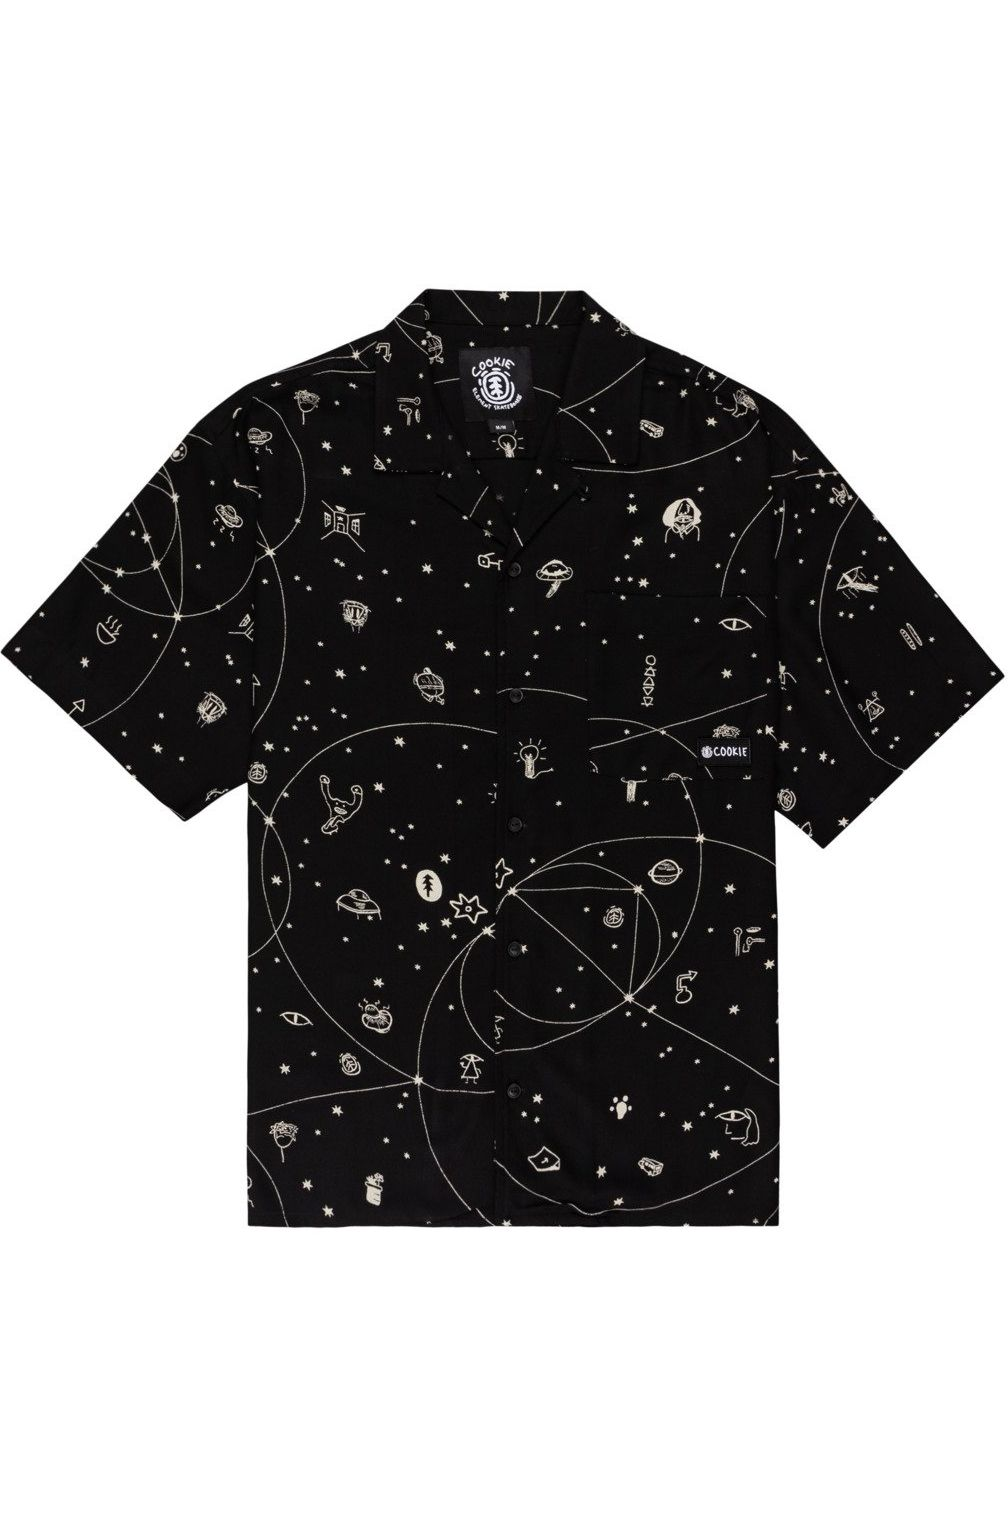 Element Shirt LOOK UP SS 92 GALAXY PACK Galaxy